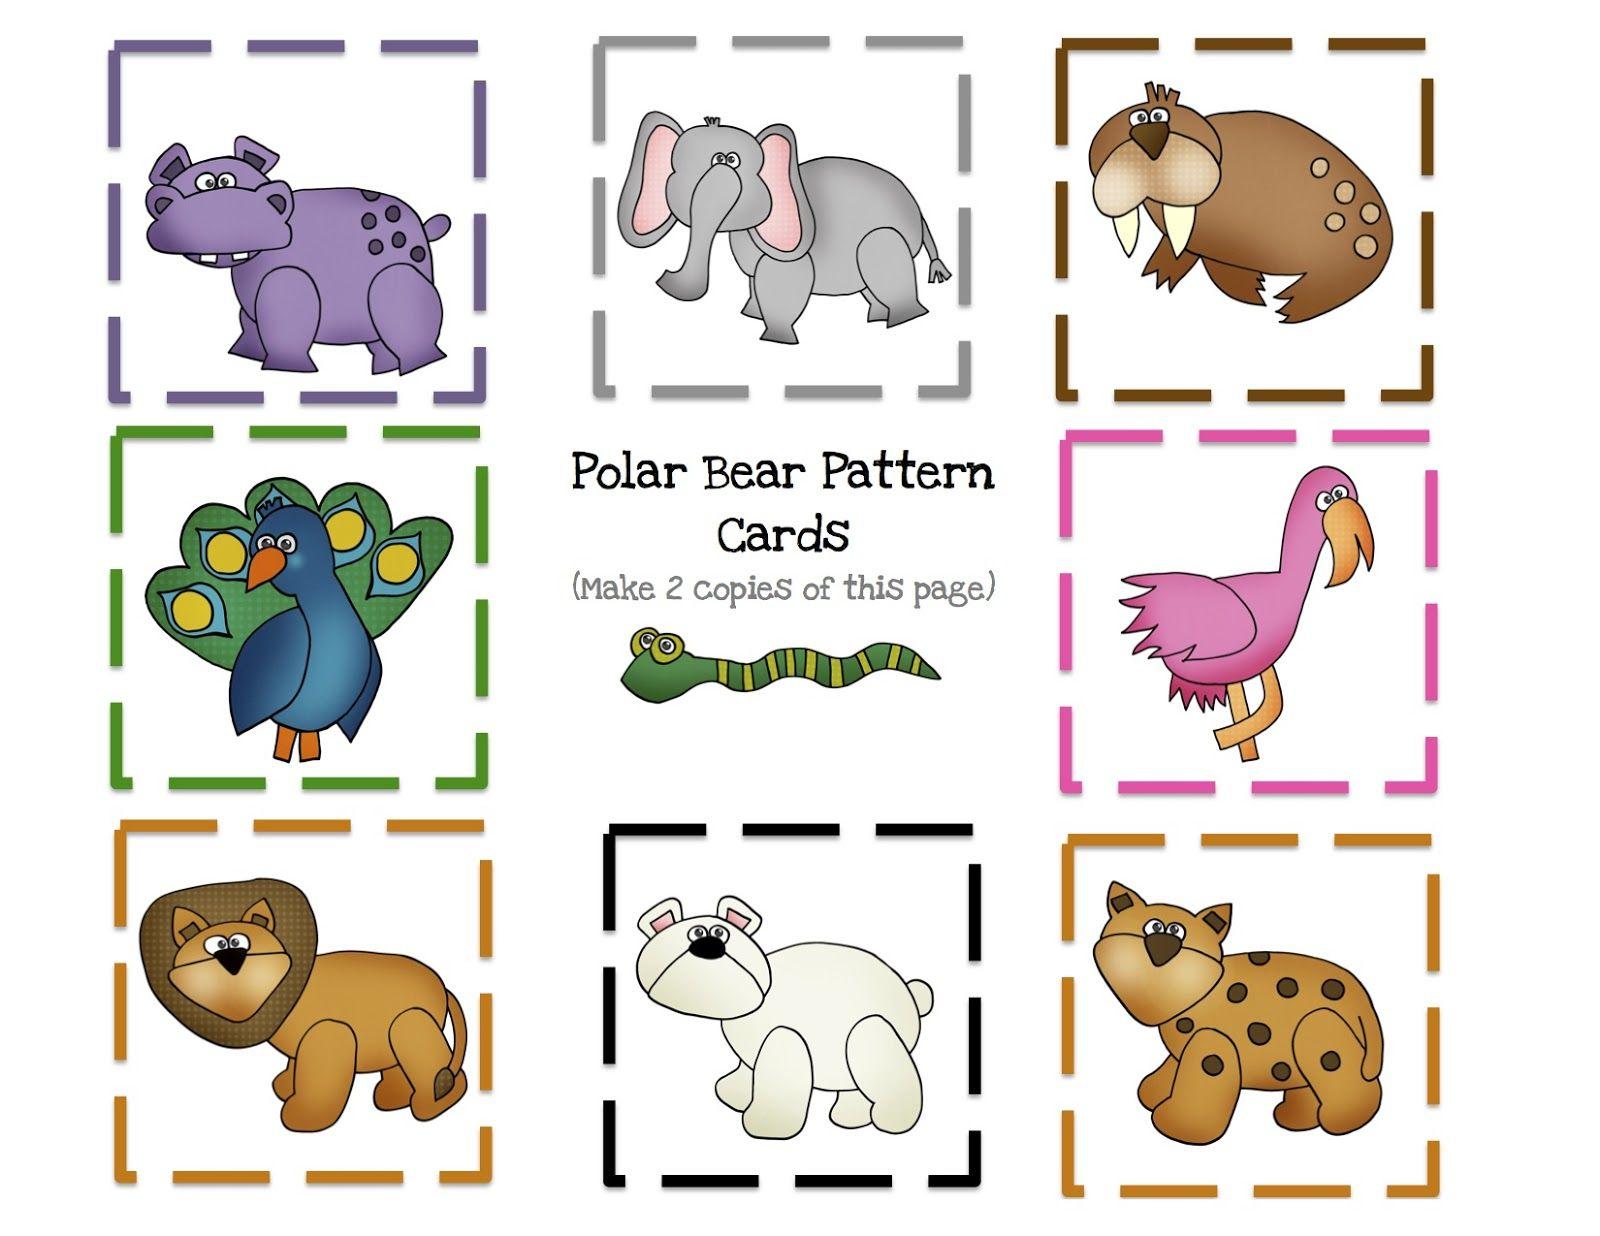 Polar Bear 8 Pattern Cards 1 600 1 236 Pixels